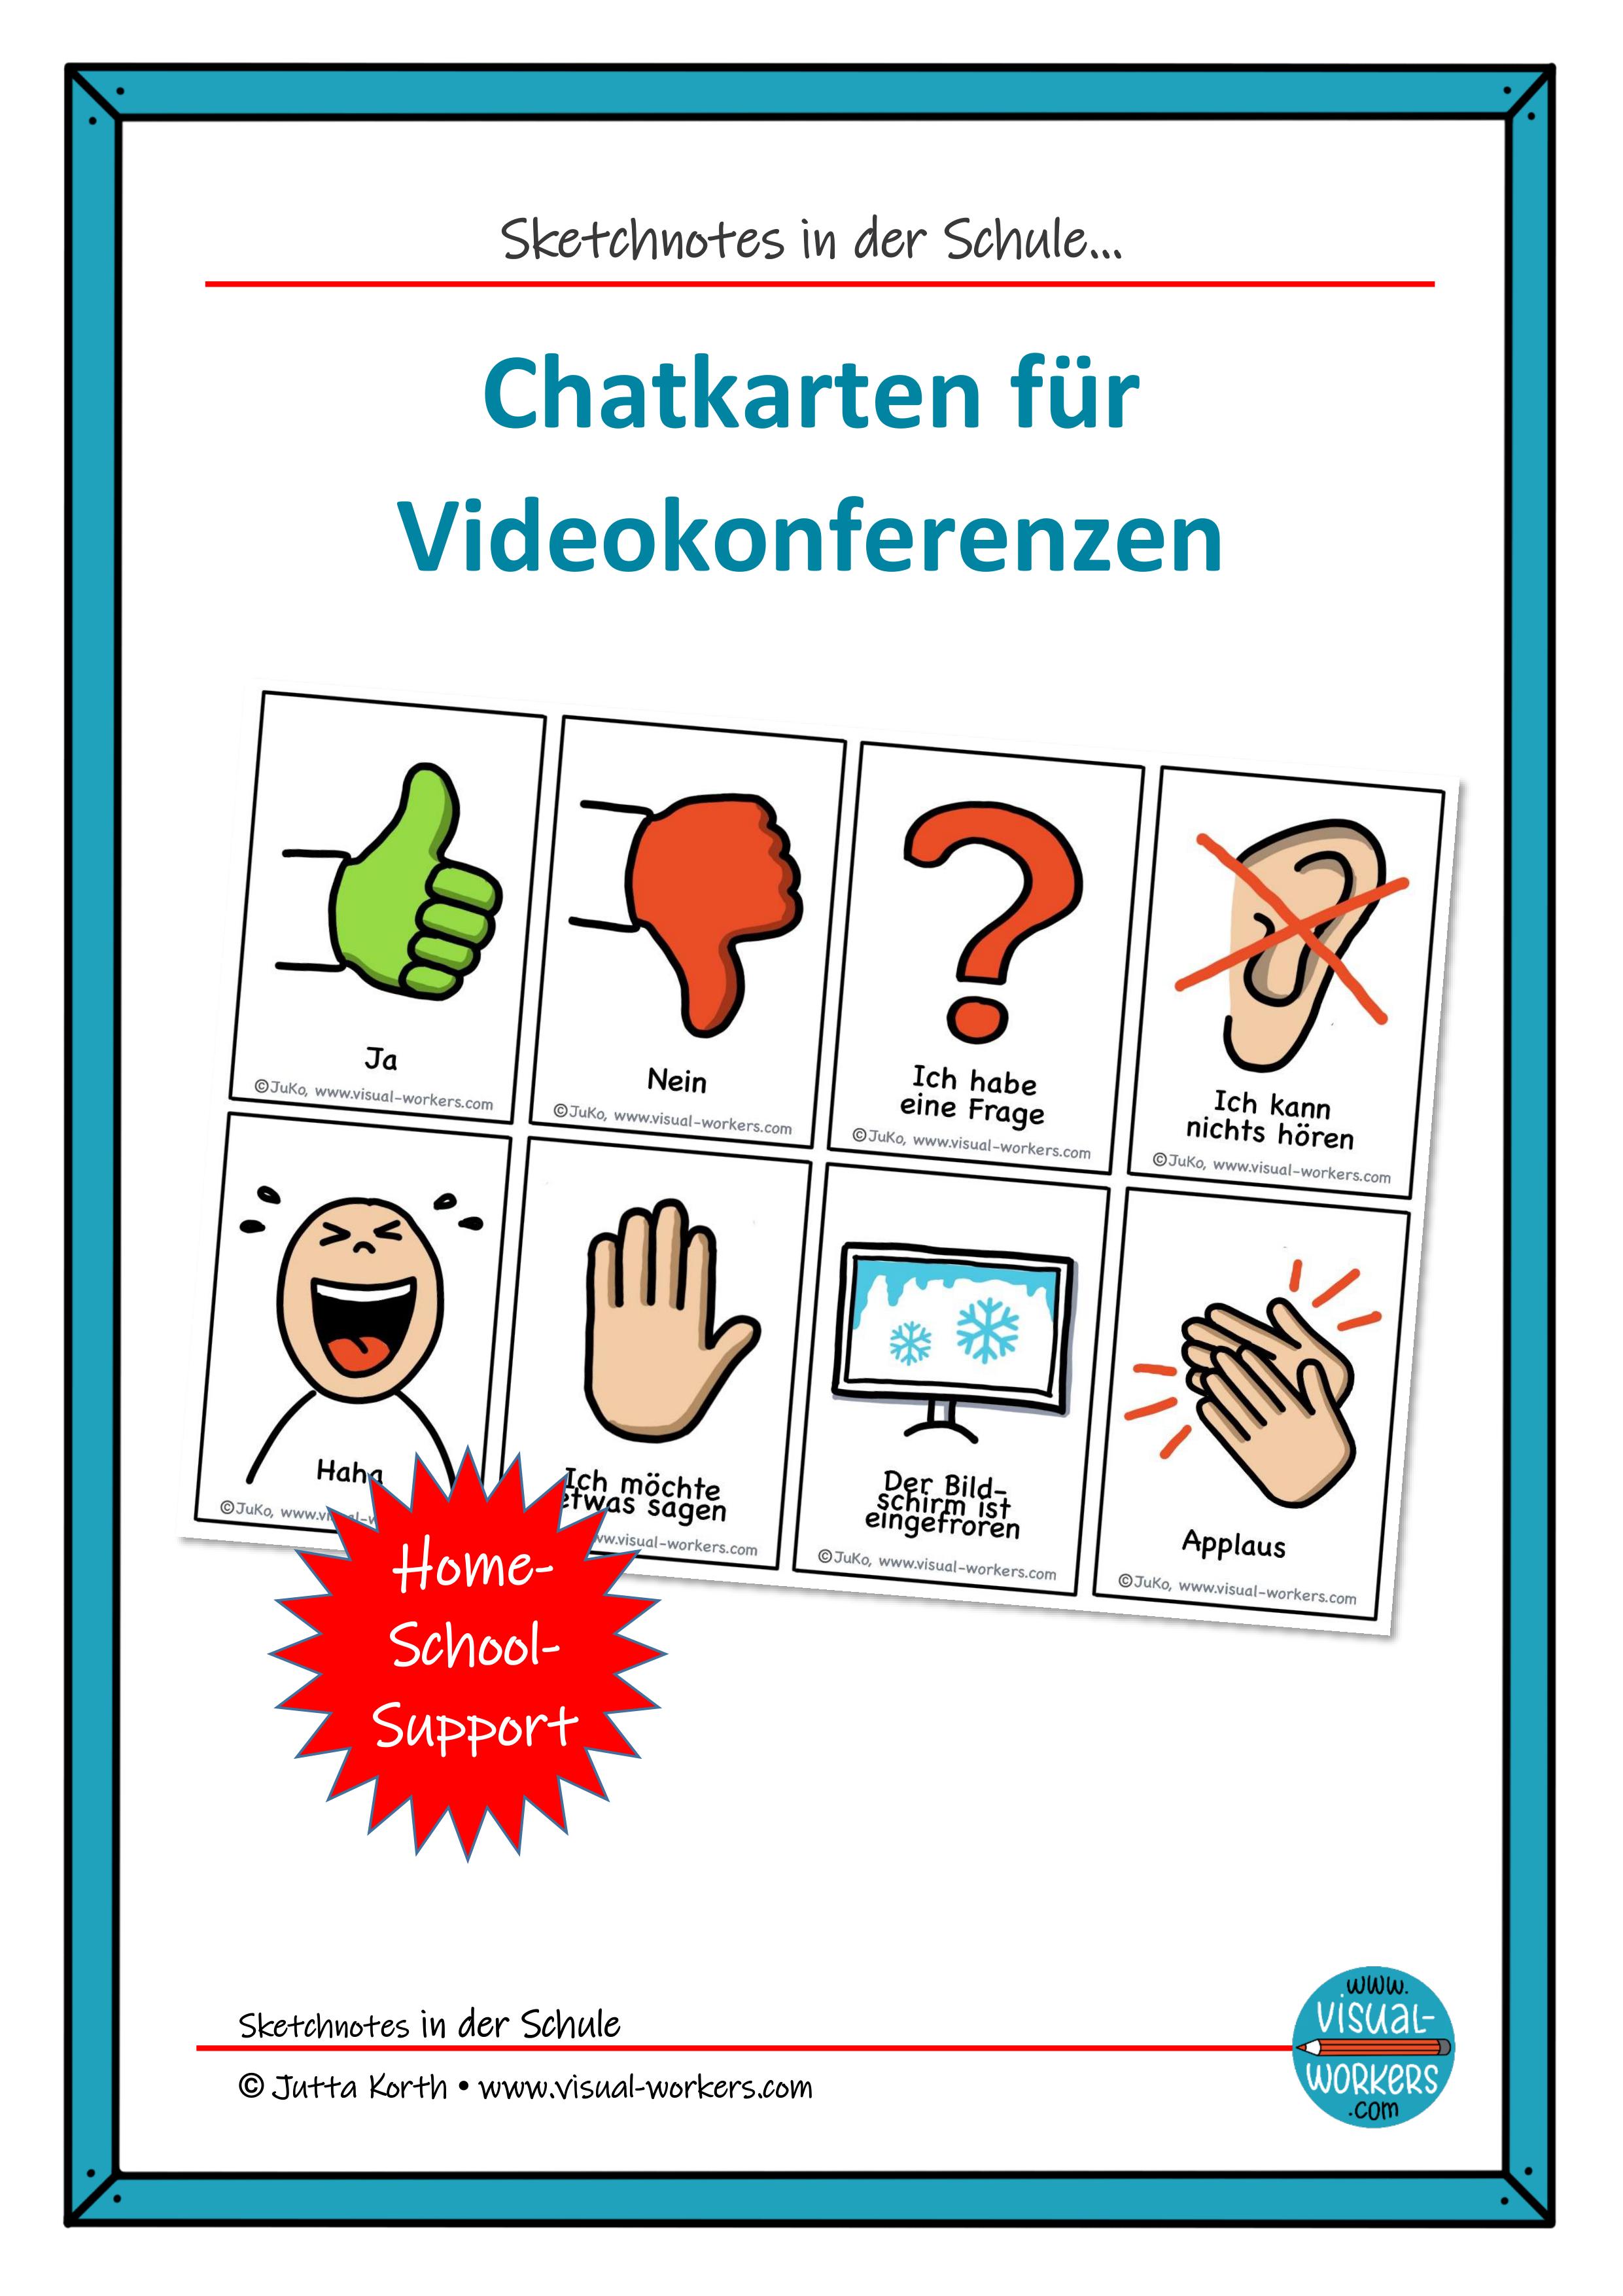 kennenlernen videokonferenz schule